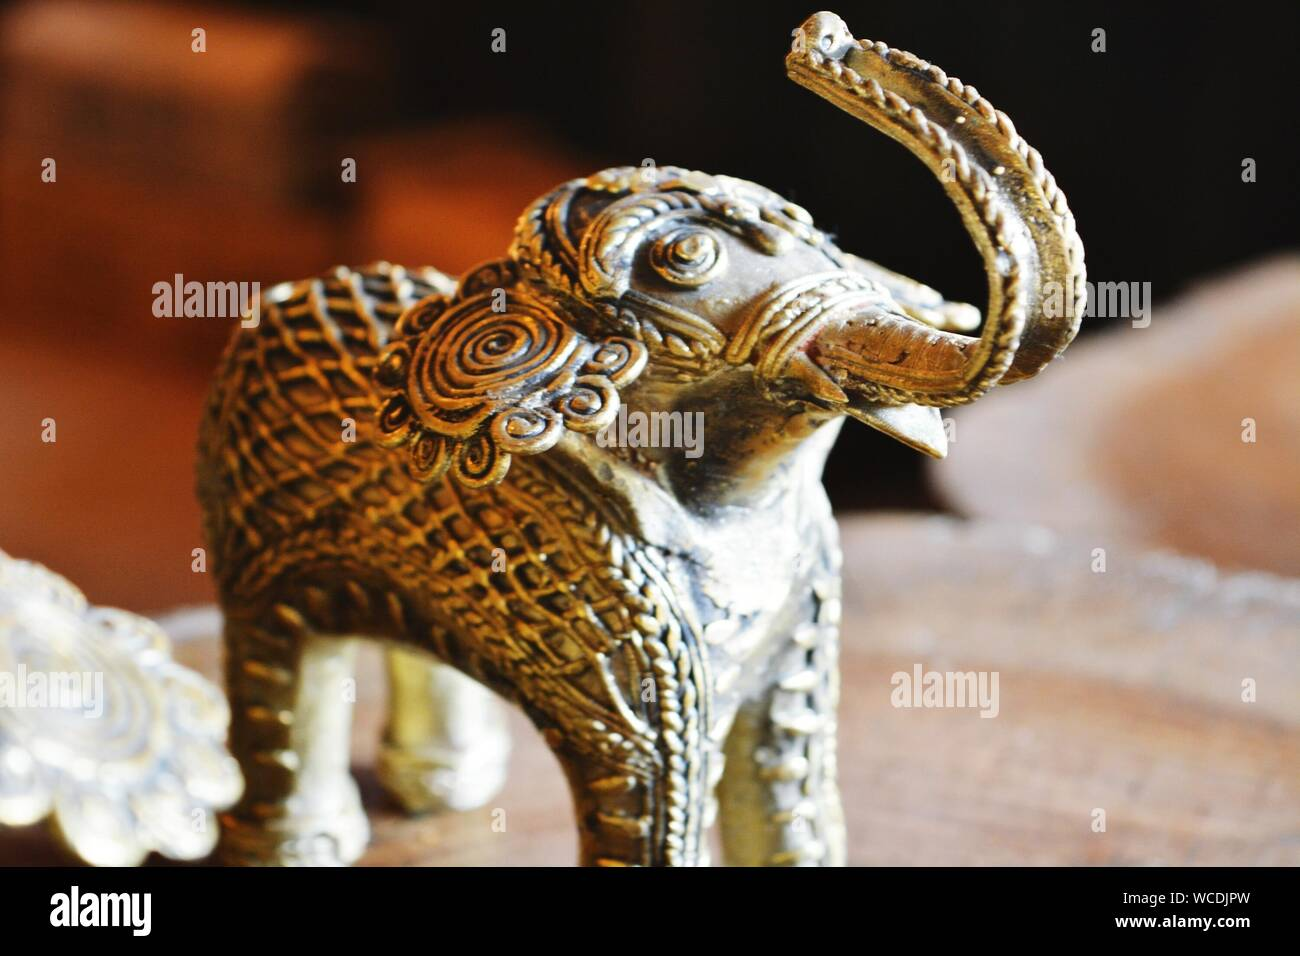 Dekoration  Türklopfer Elefant Messing mit schöner Patina